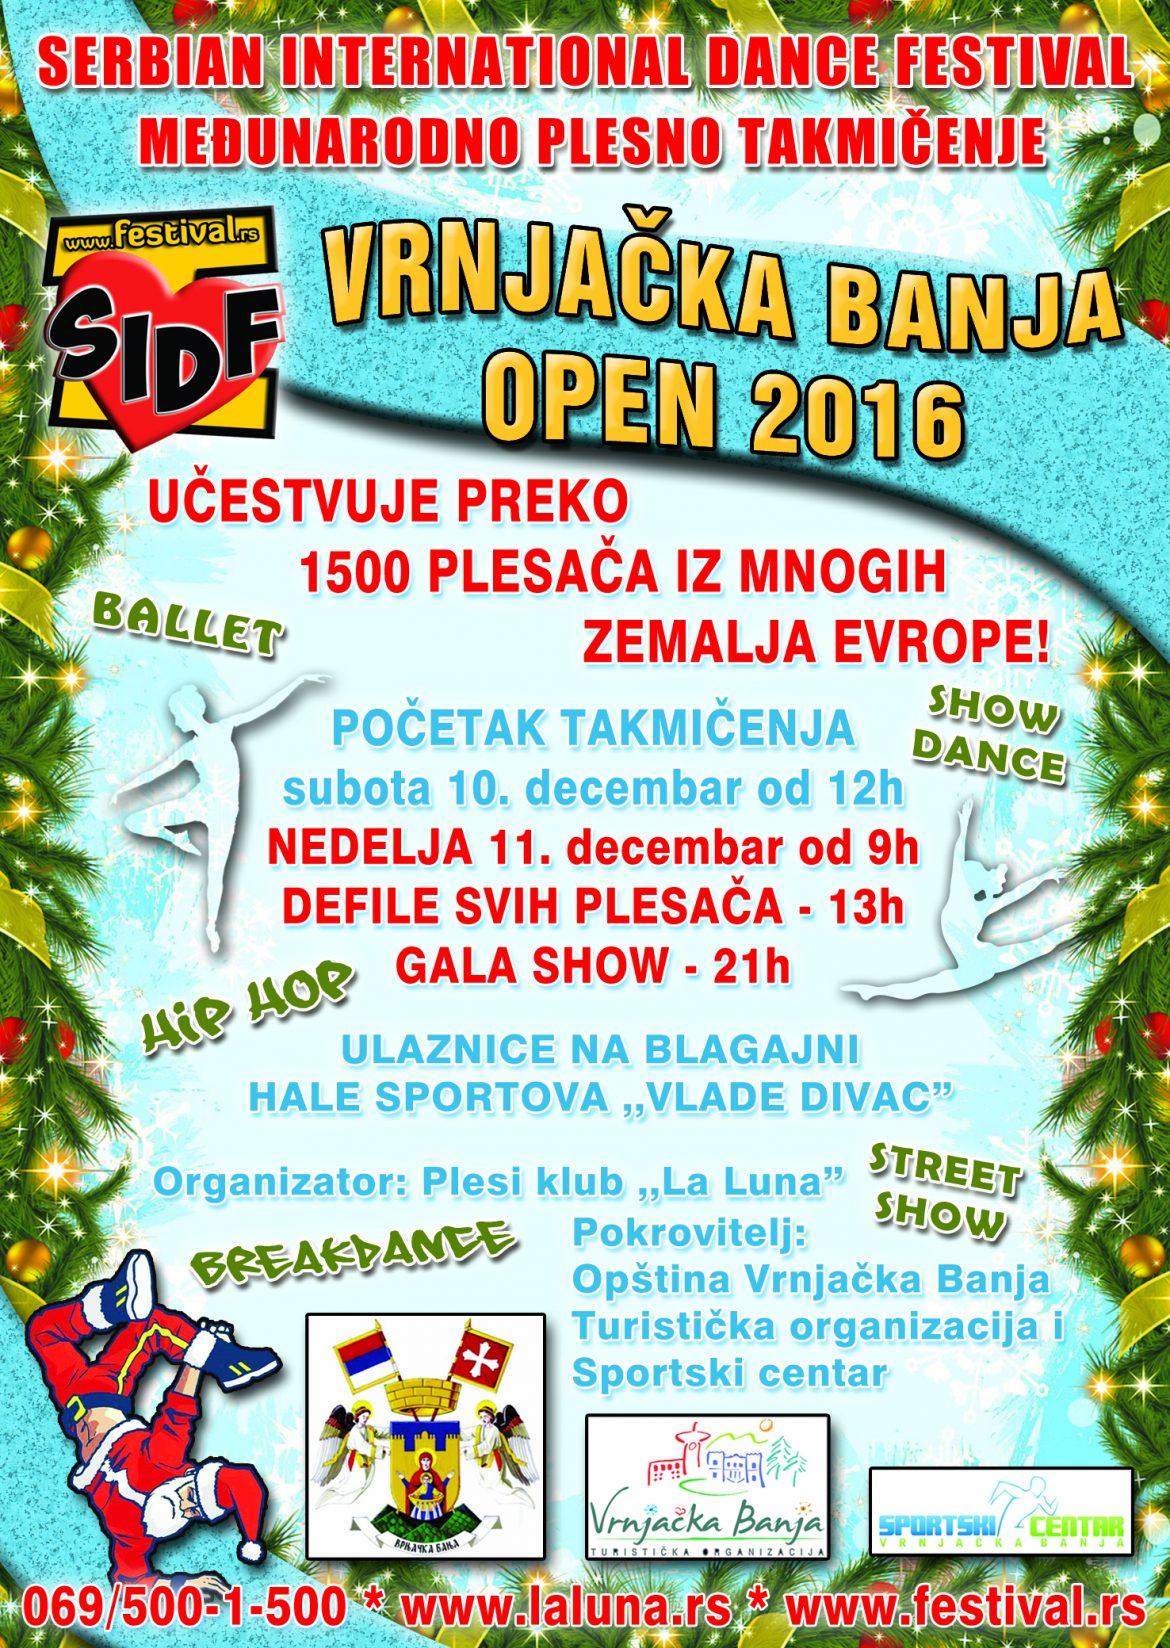 vrnjacka-banja-open-2016-letak-b6-1